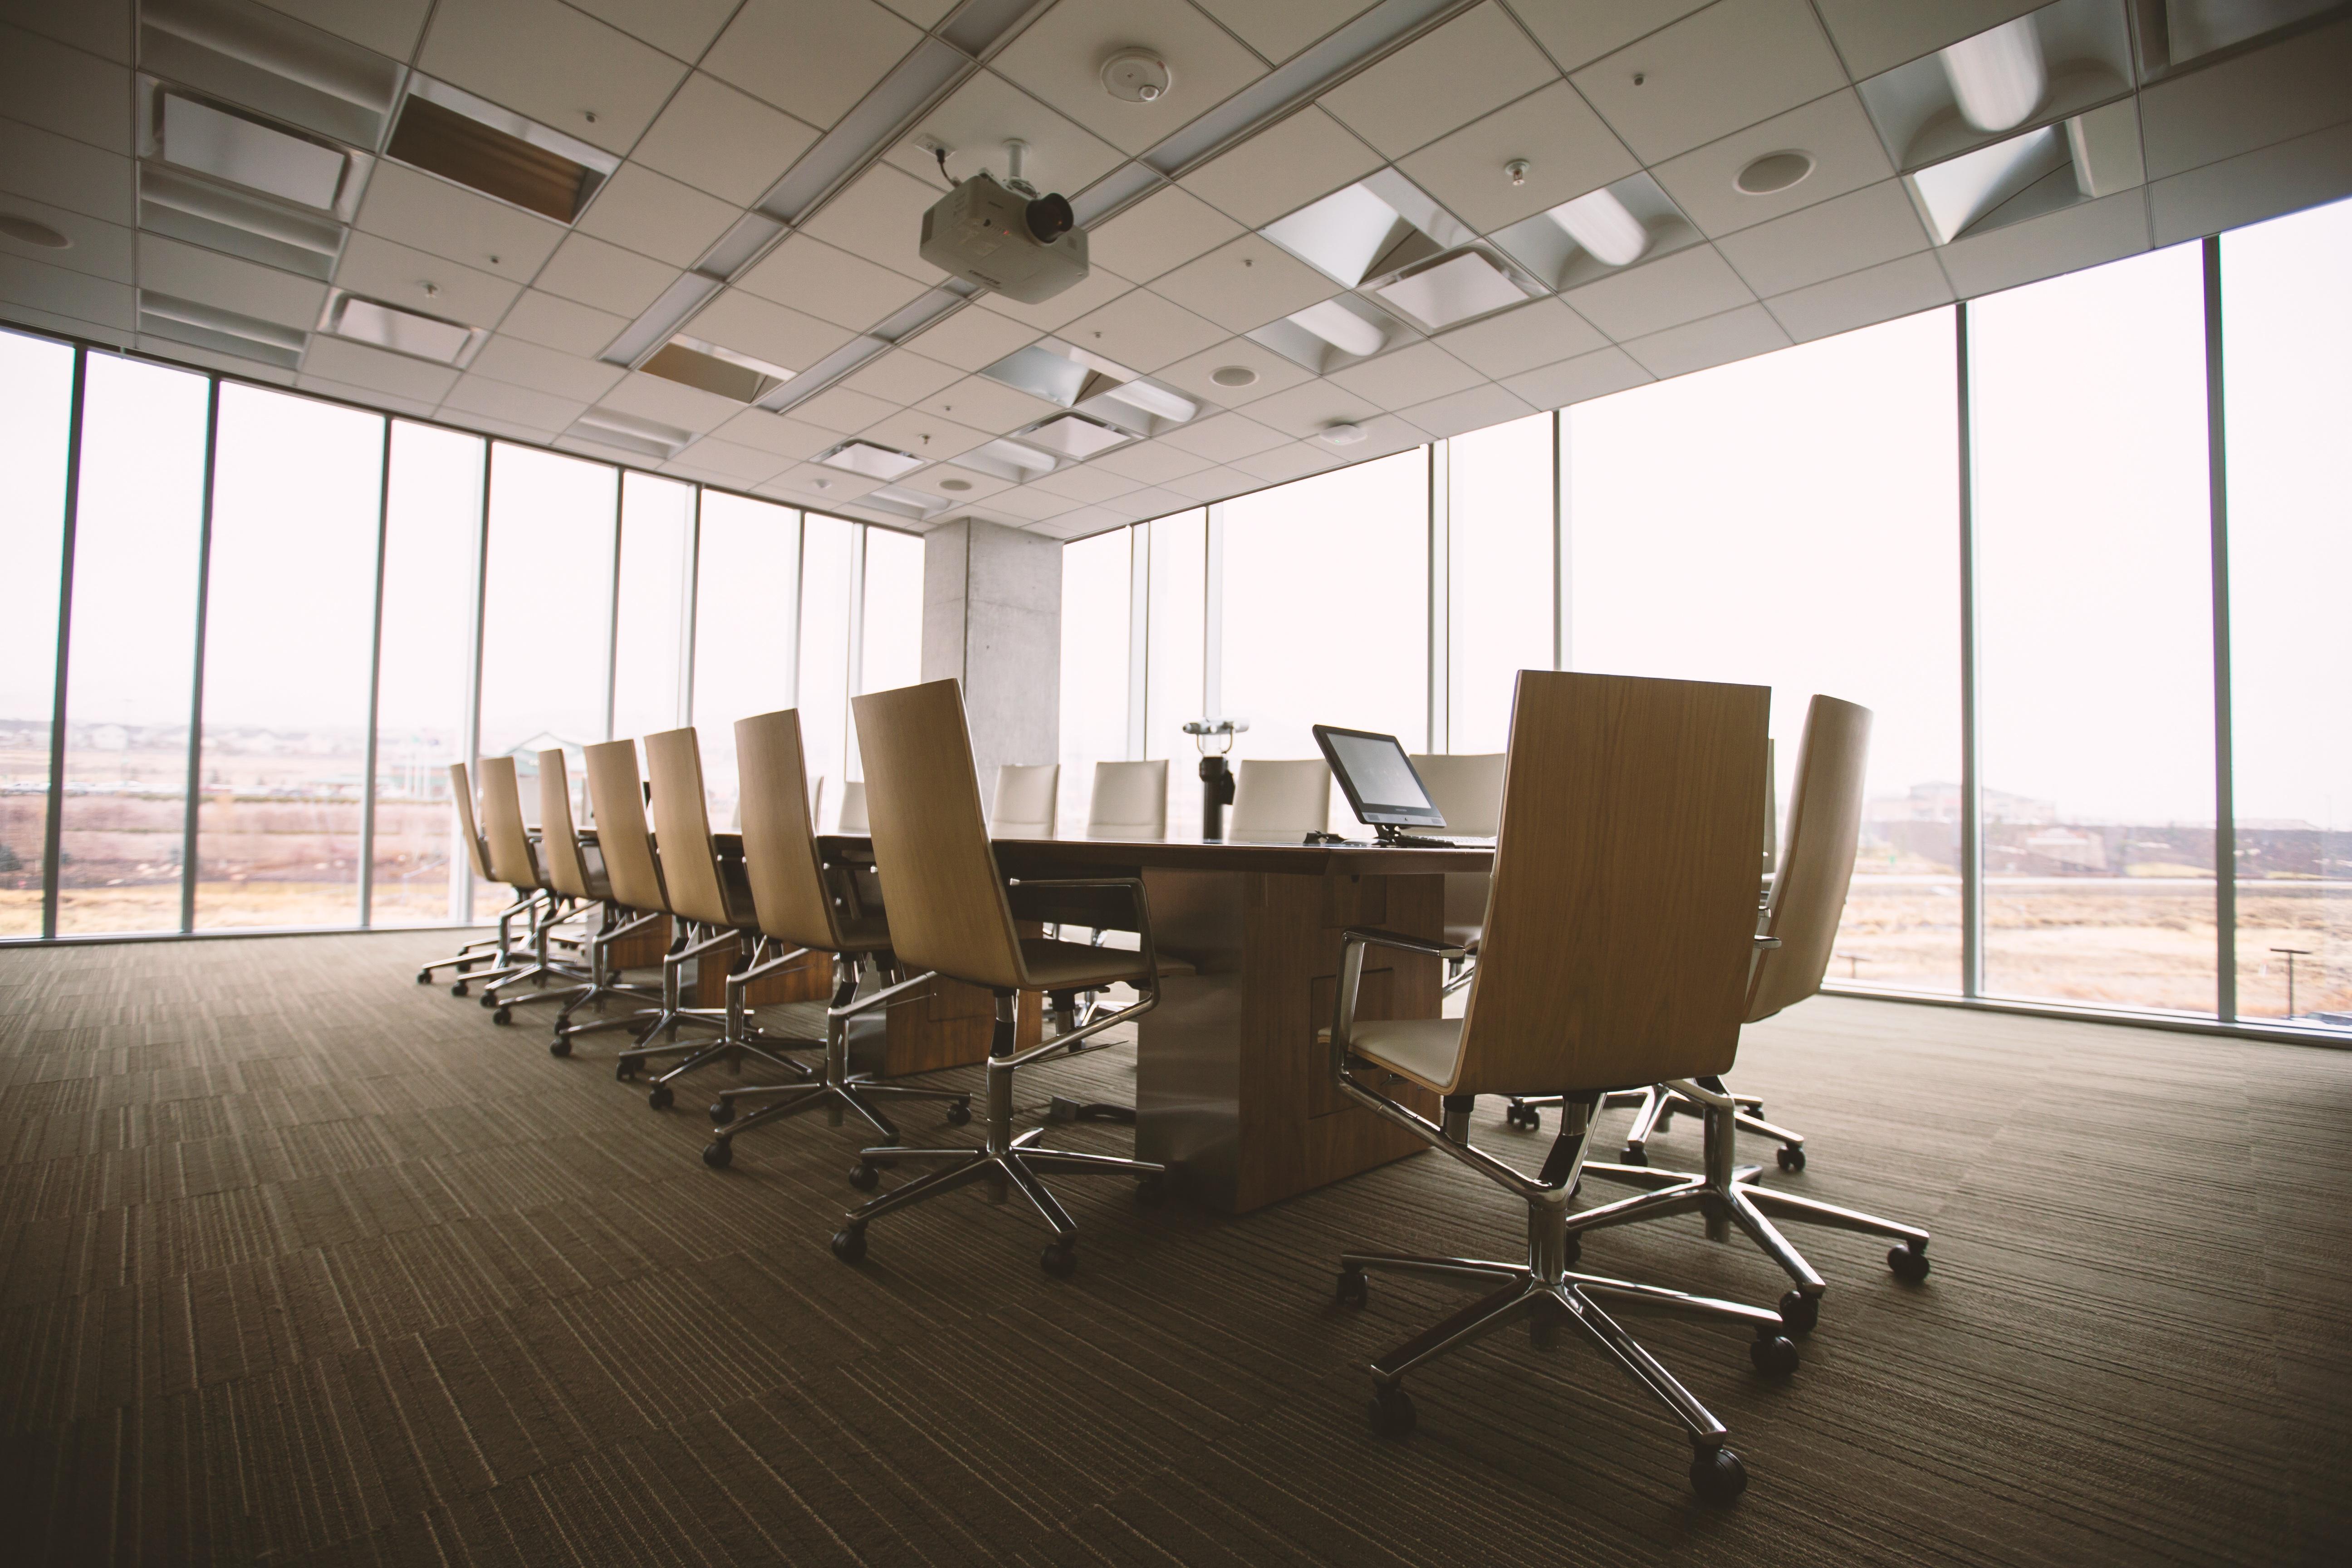 Sillas de oficina reclinables